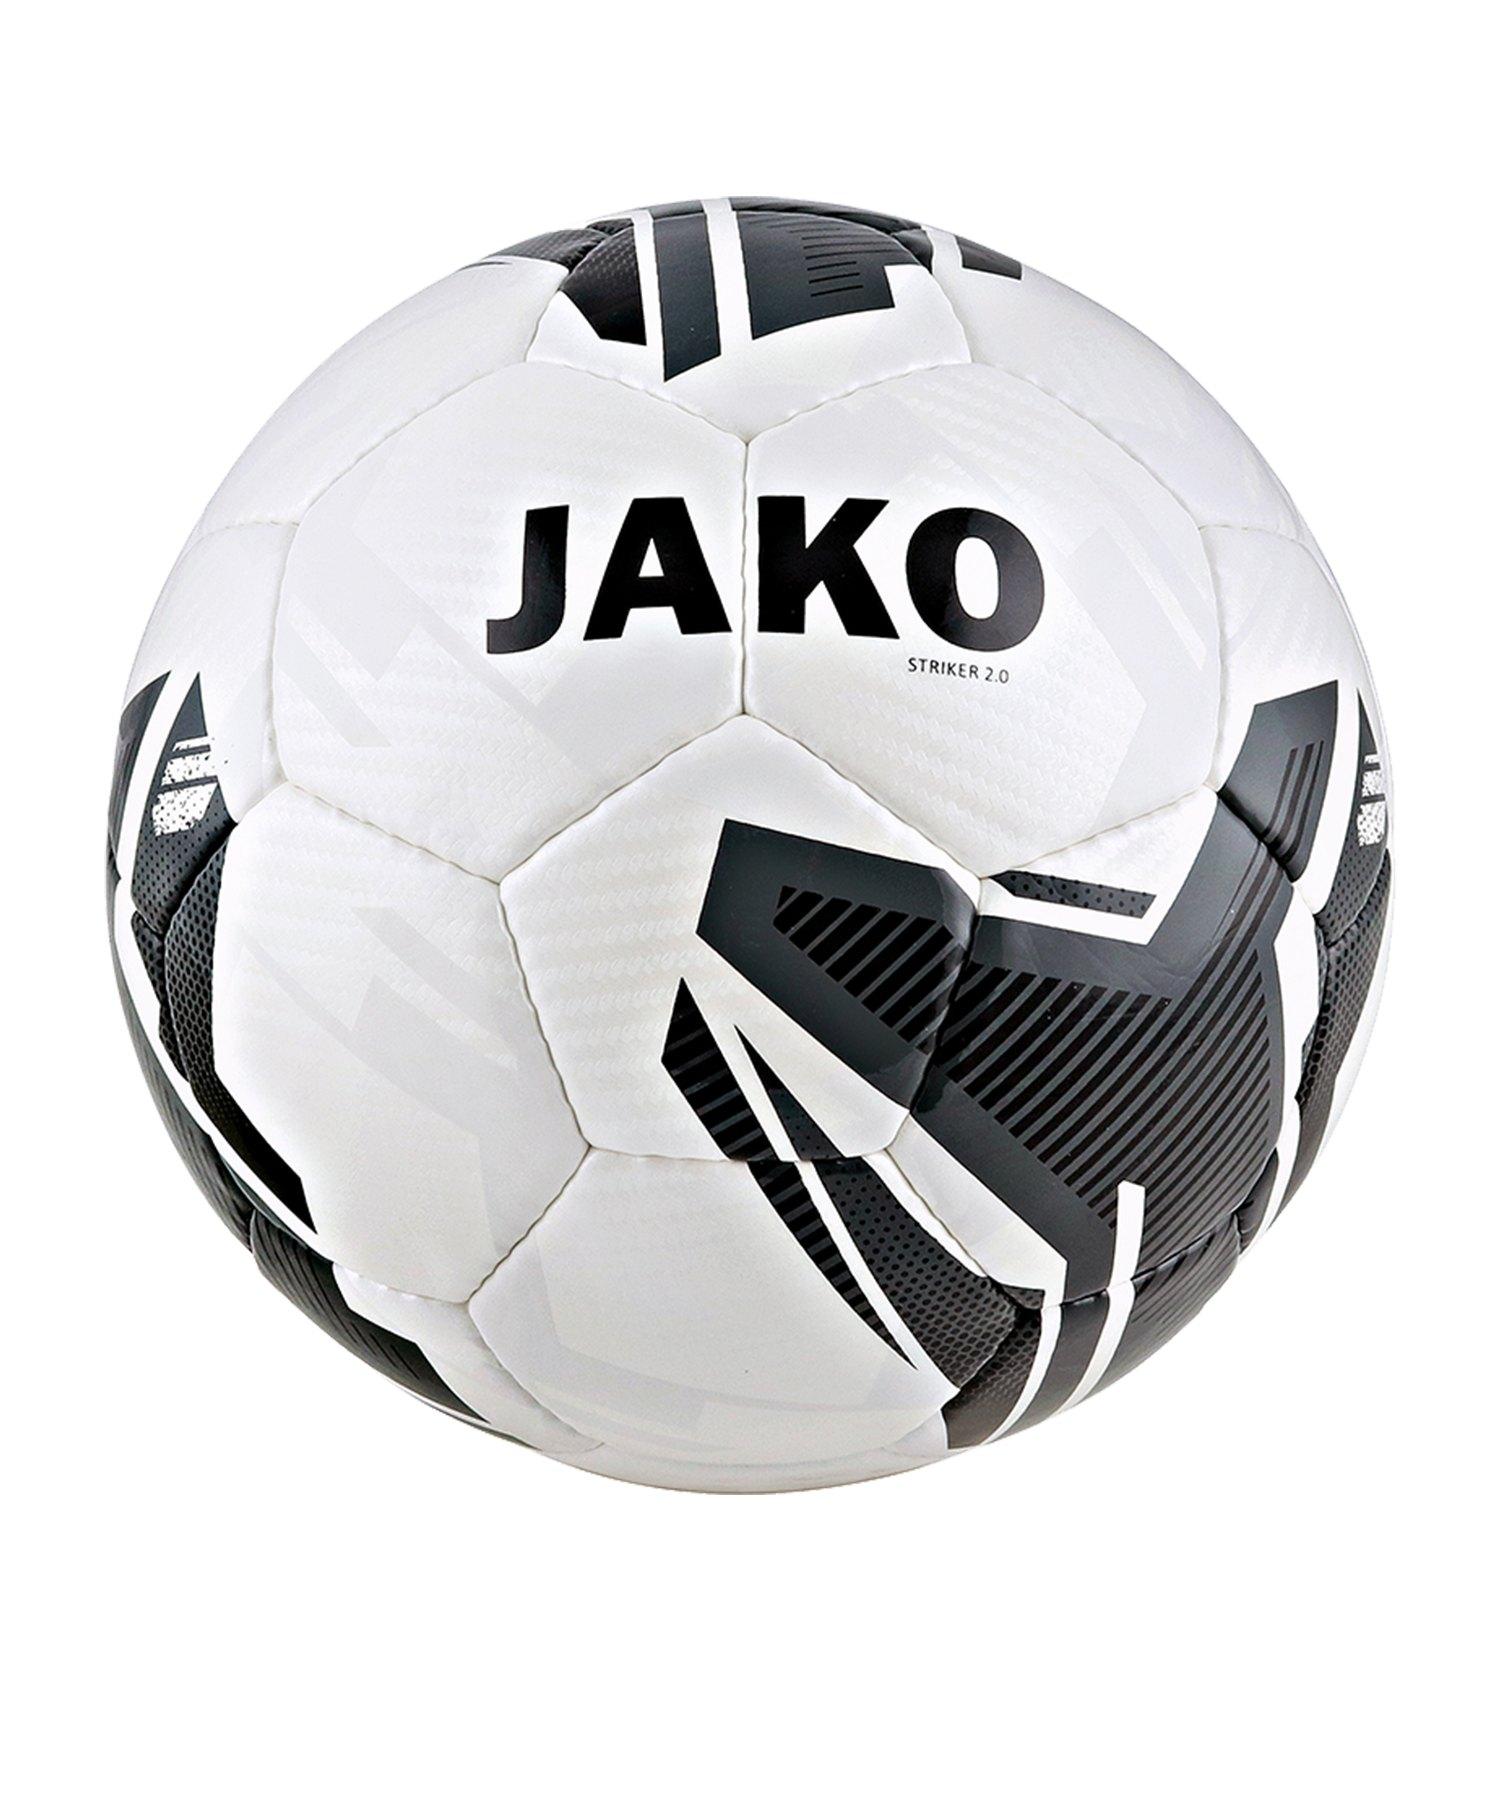 Jako Striker 2.0 Trainingsball Weiss Grau F21 - Weiss